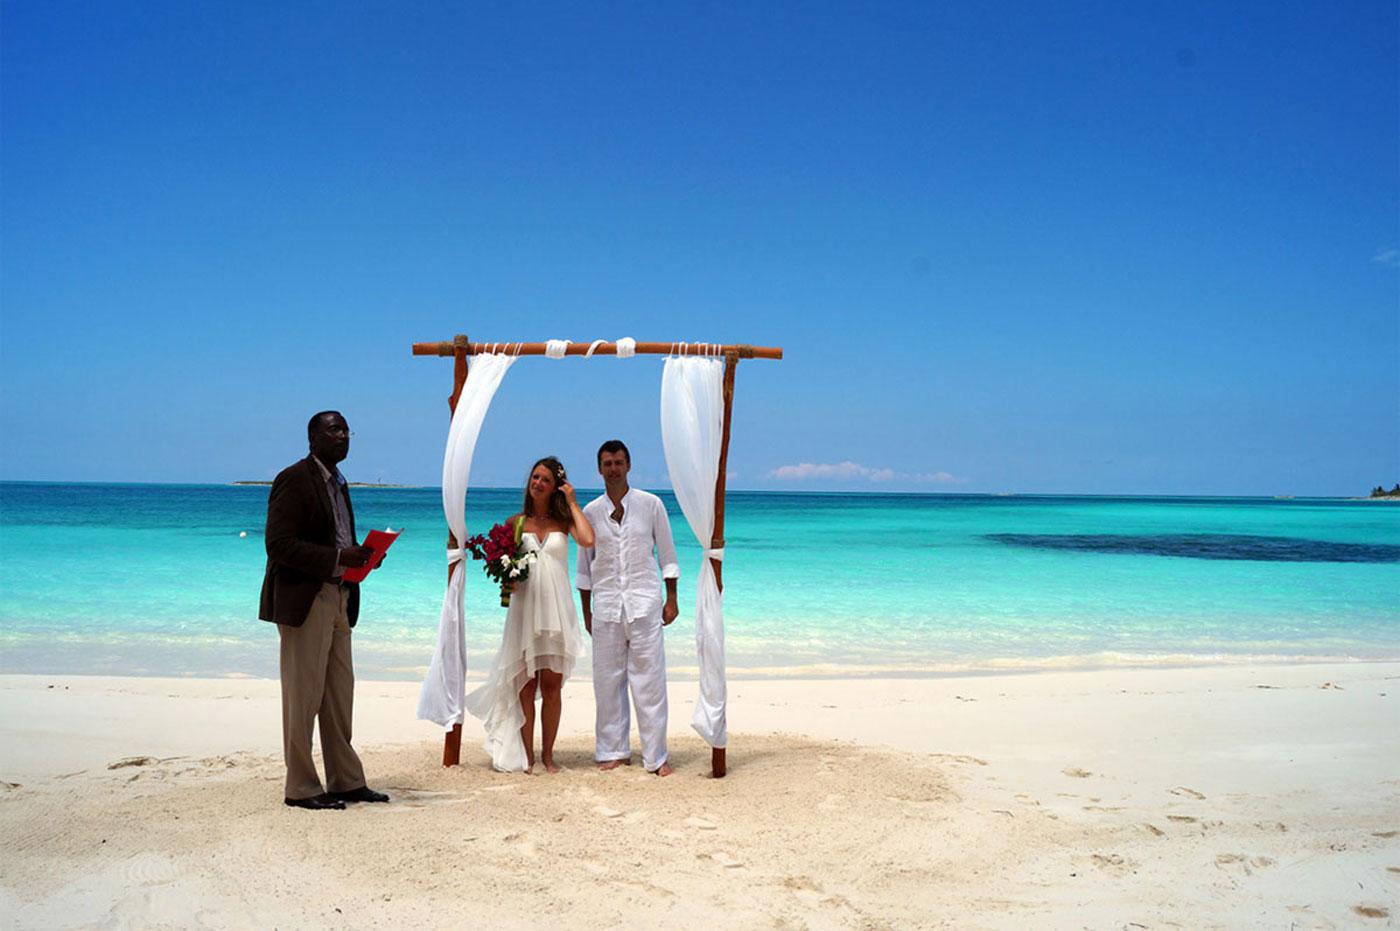 intimate wedding on the beach in exuma